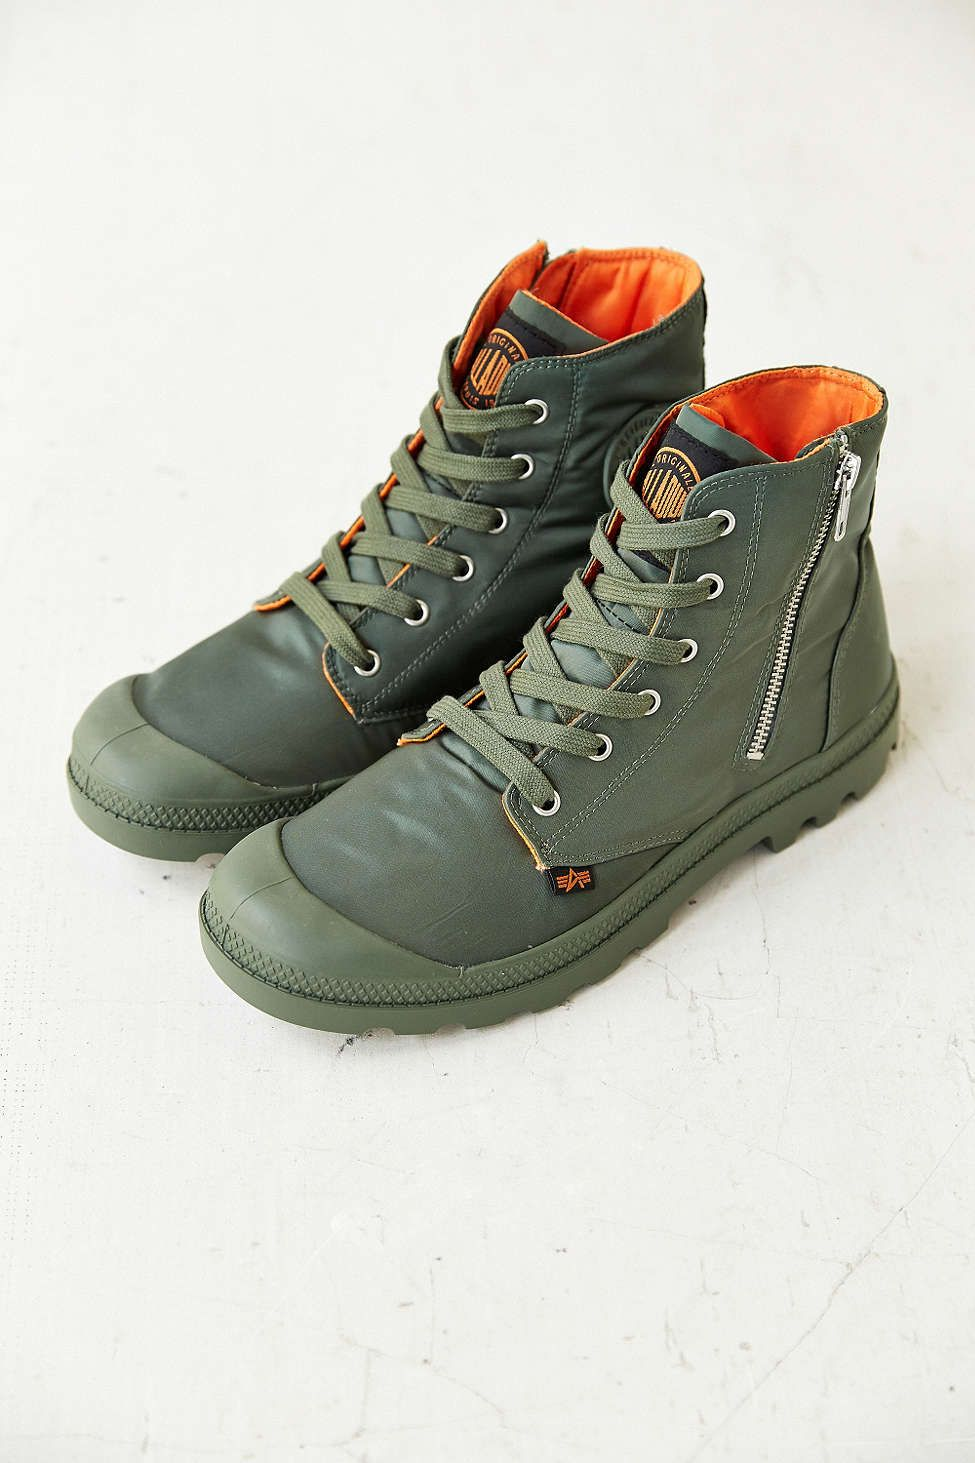 29548956c984b Palladium X Alpha Industries Pampa Low-Top Zip Boot   Boots   Boots ...